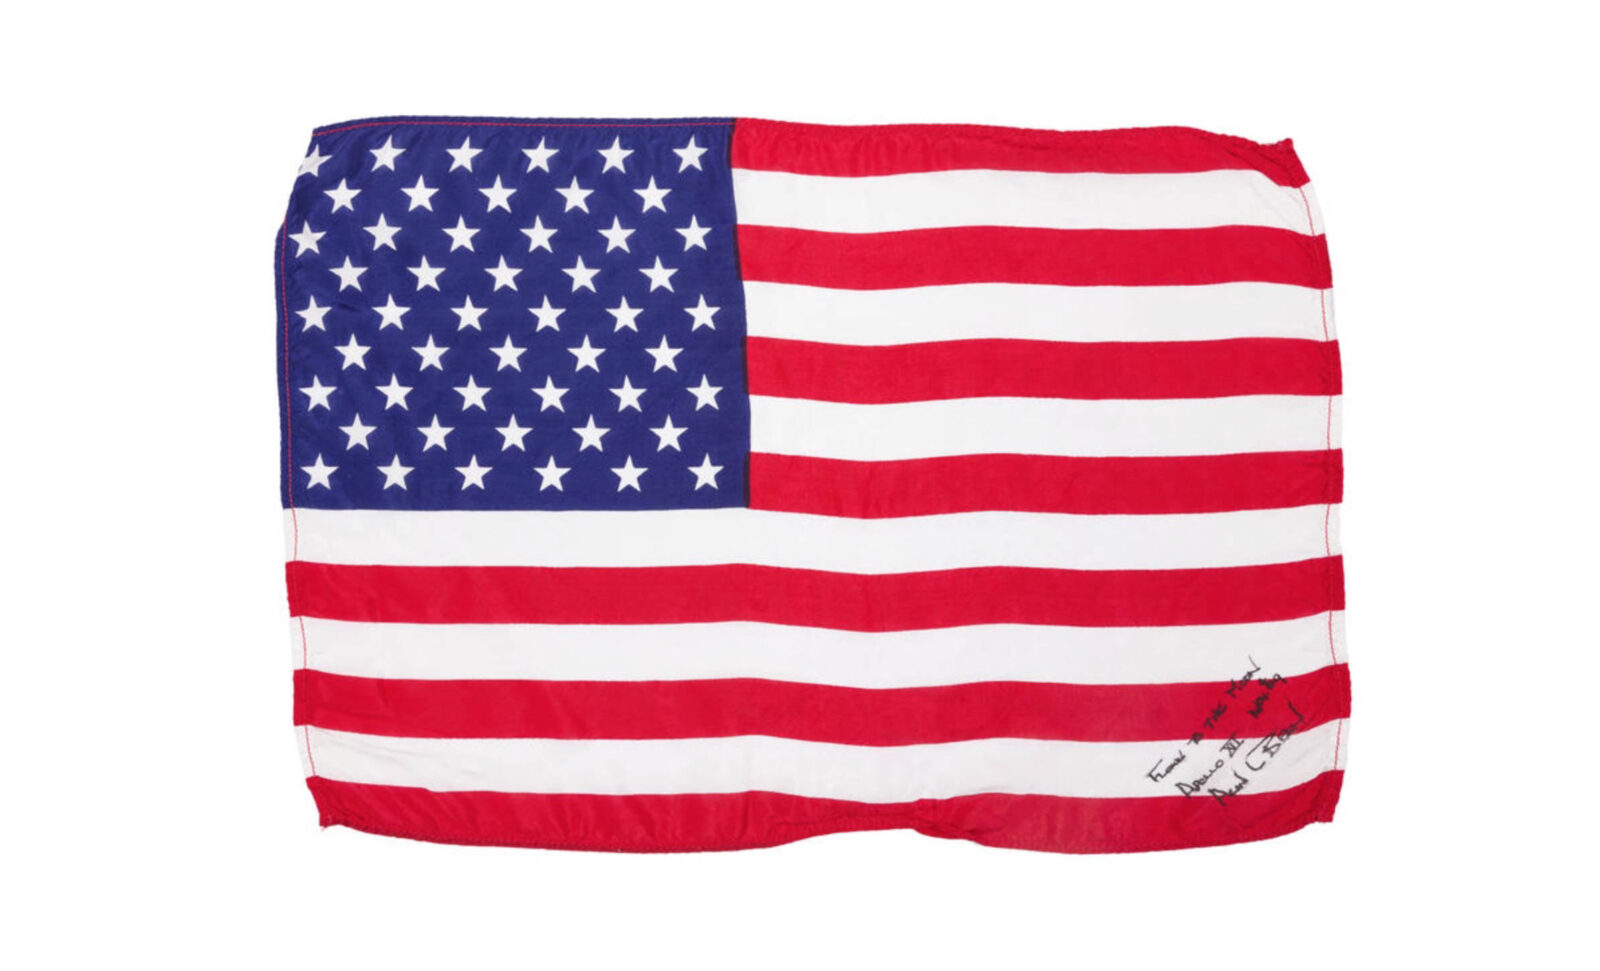 American Moon Flag Apollo 1600x971 - Apollo 12 Moon Flag